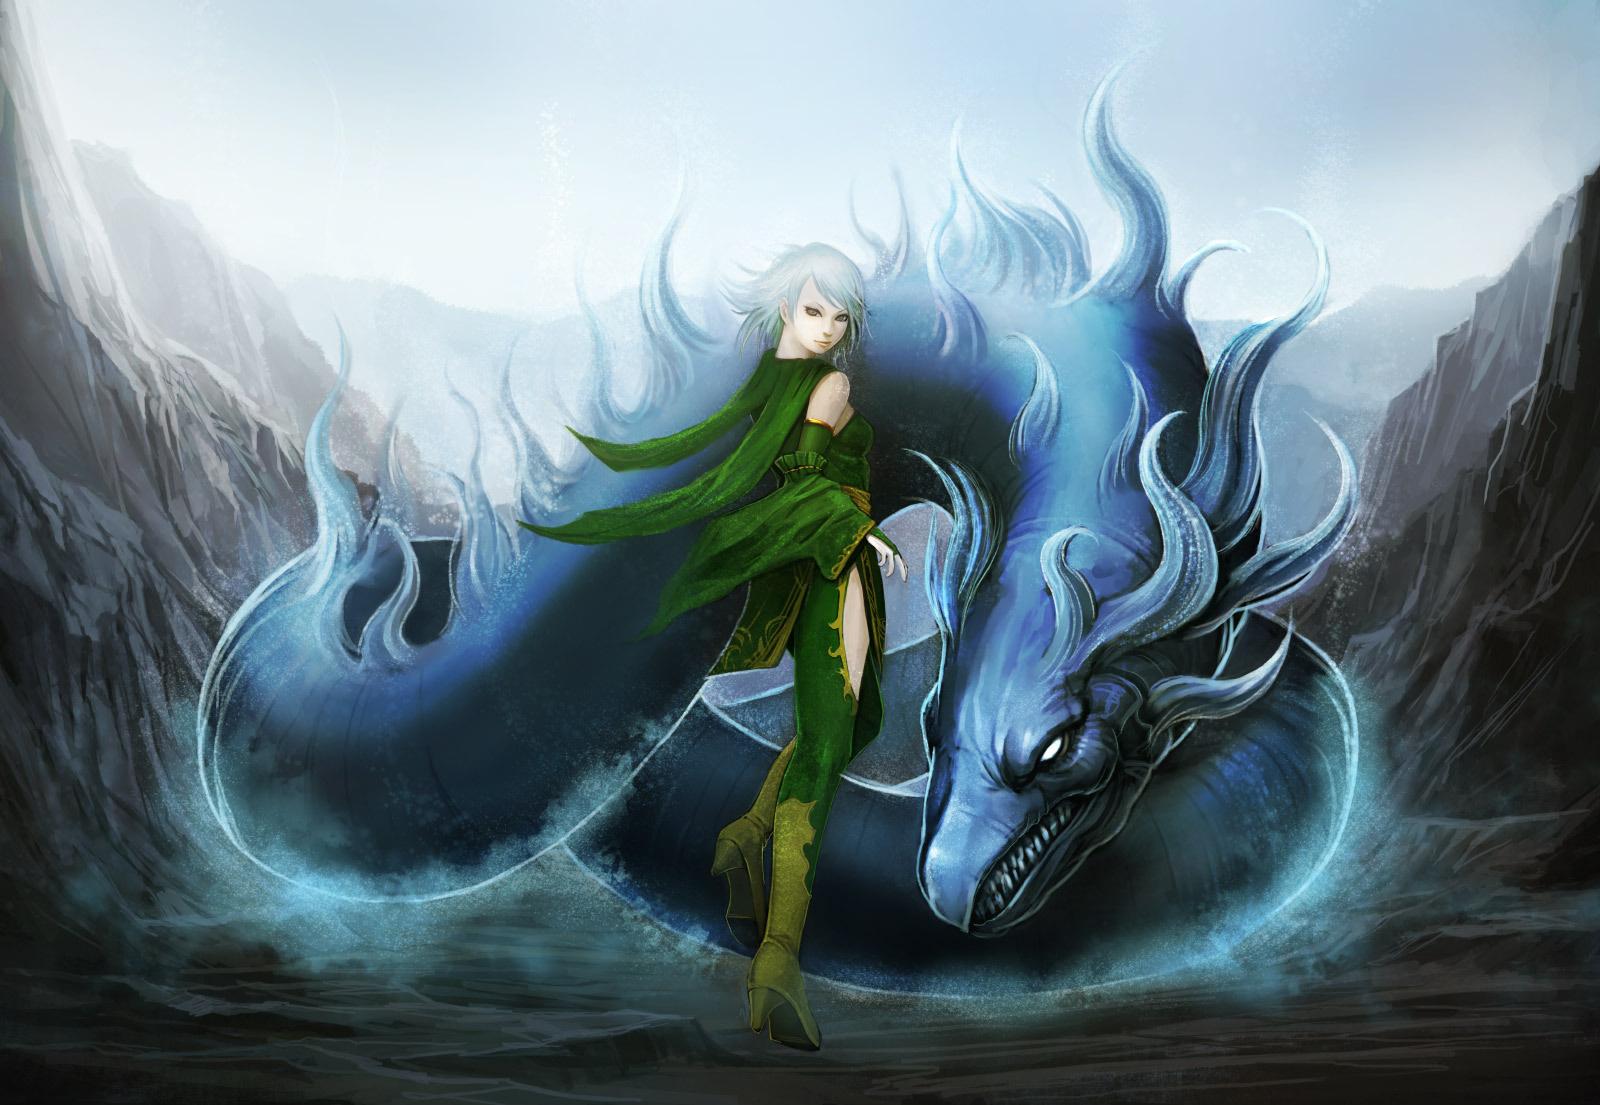 Moving dragon wallpapers for desktop wallpapersafari - Anime moving wallpaper for pc ...